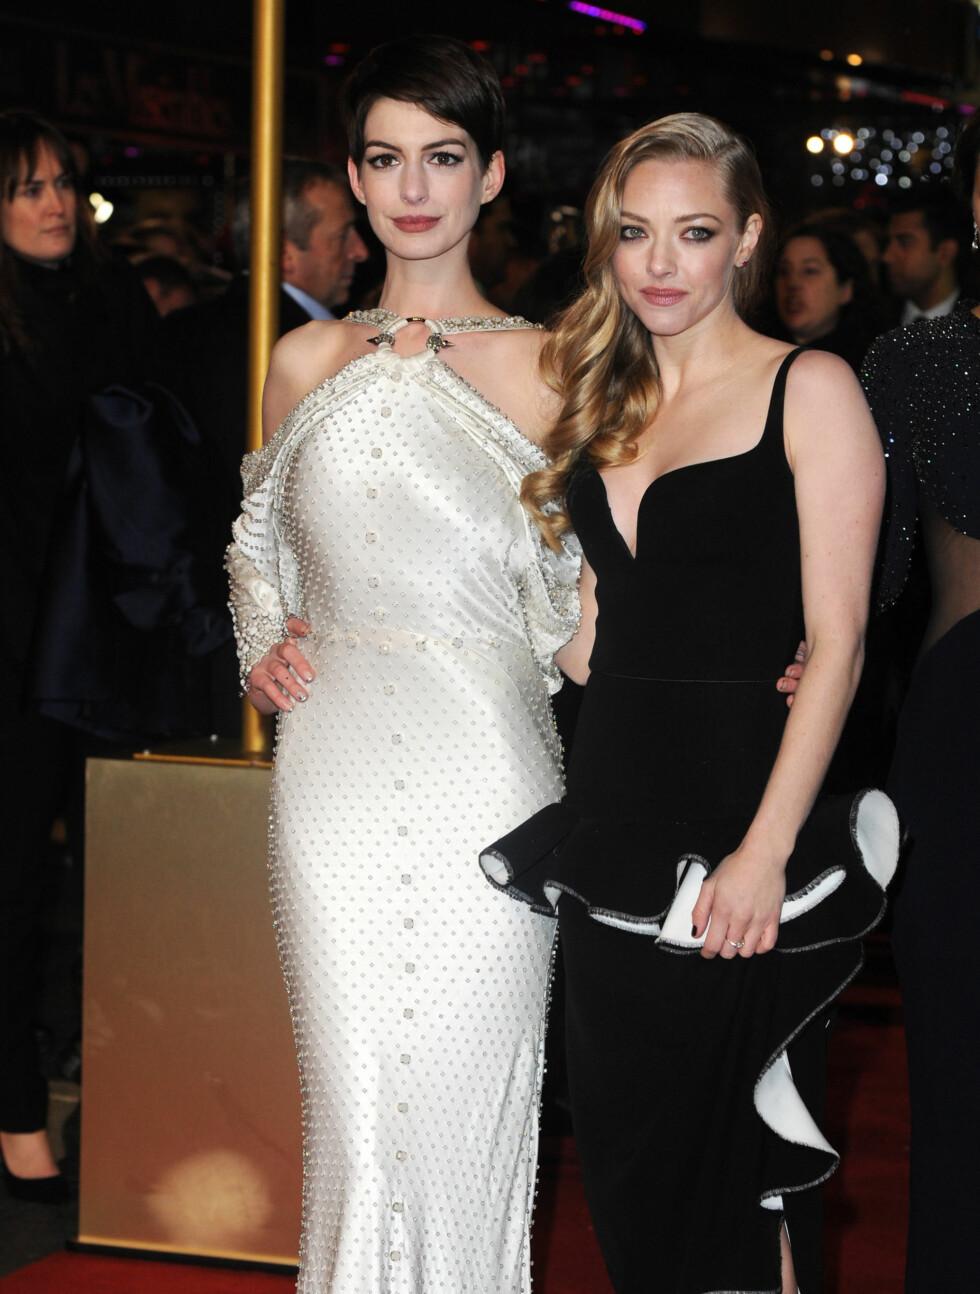 «LES MISERABLES» PREMIERE I LONDON: Anne Hathaway og Amanda Seyfreid Foto: Stella Pictures